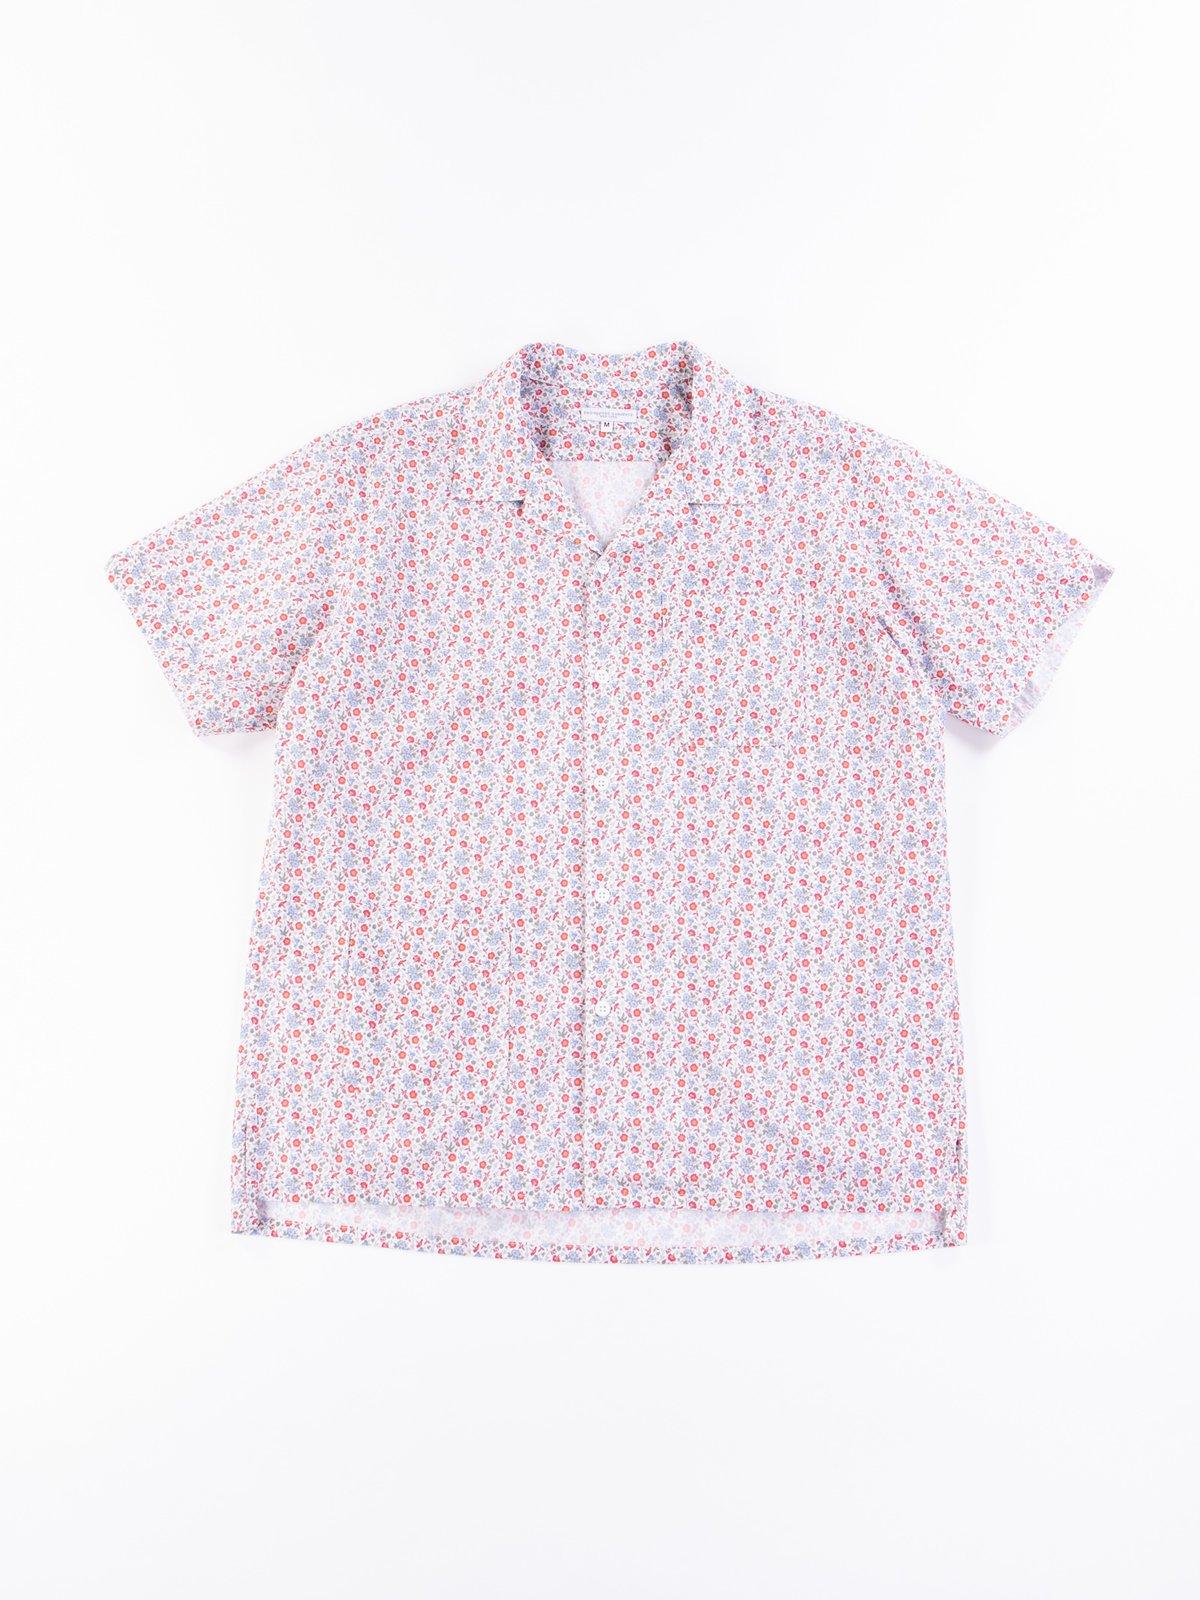 White/Blue/Orange Small Floral Camp Shirt - Image 1